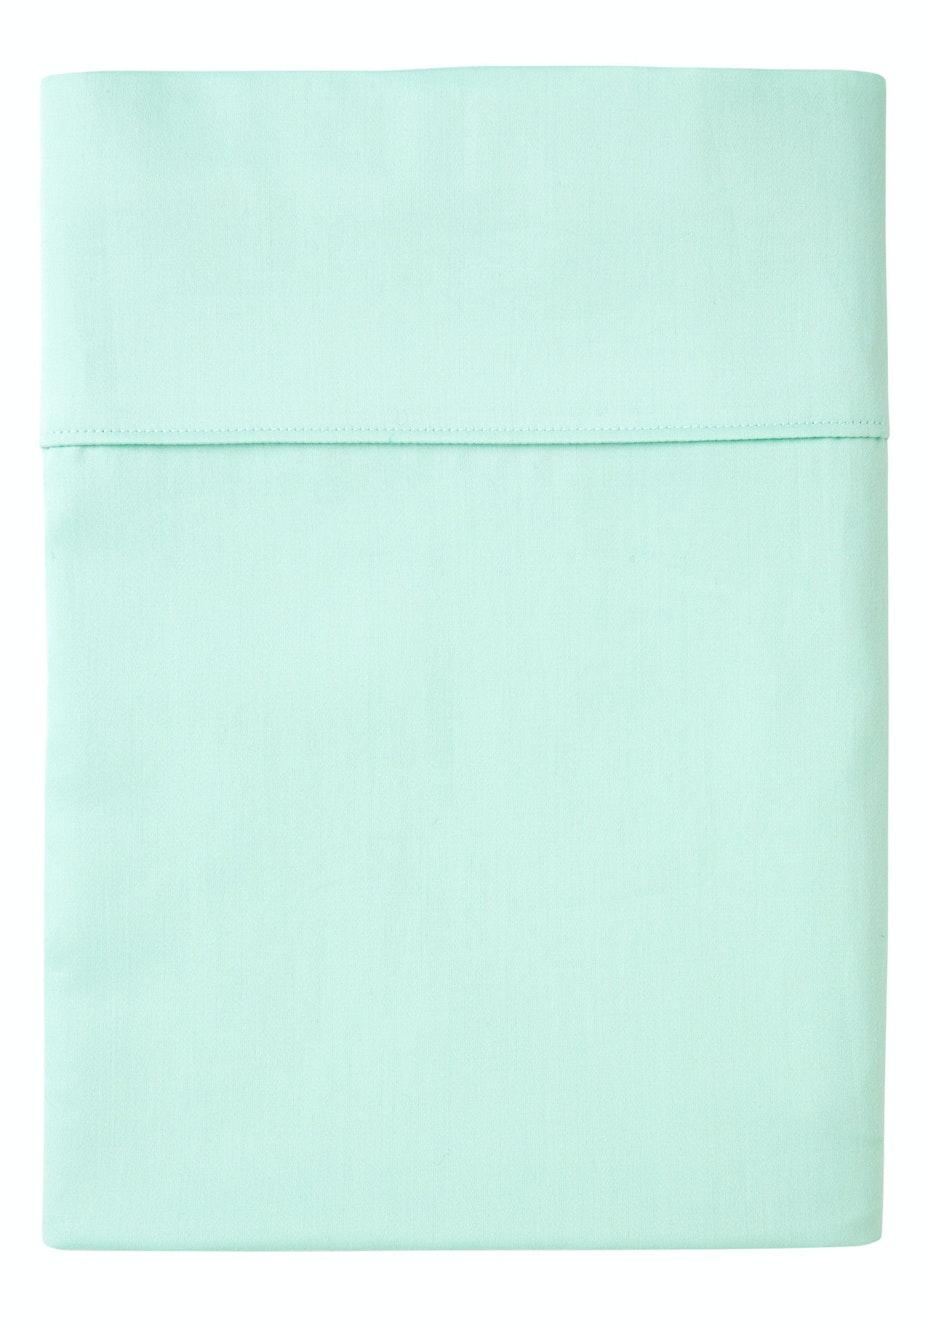 Goosebumps - Flat Sheet - Single - Mint Plain